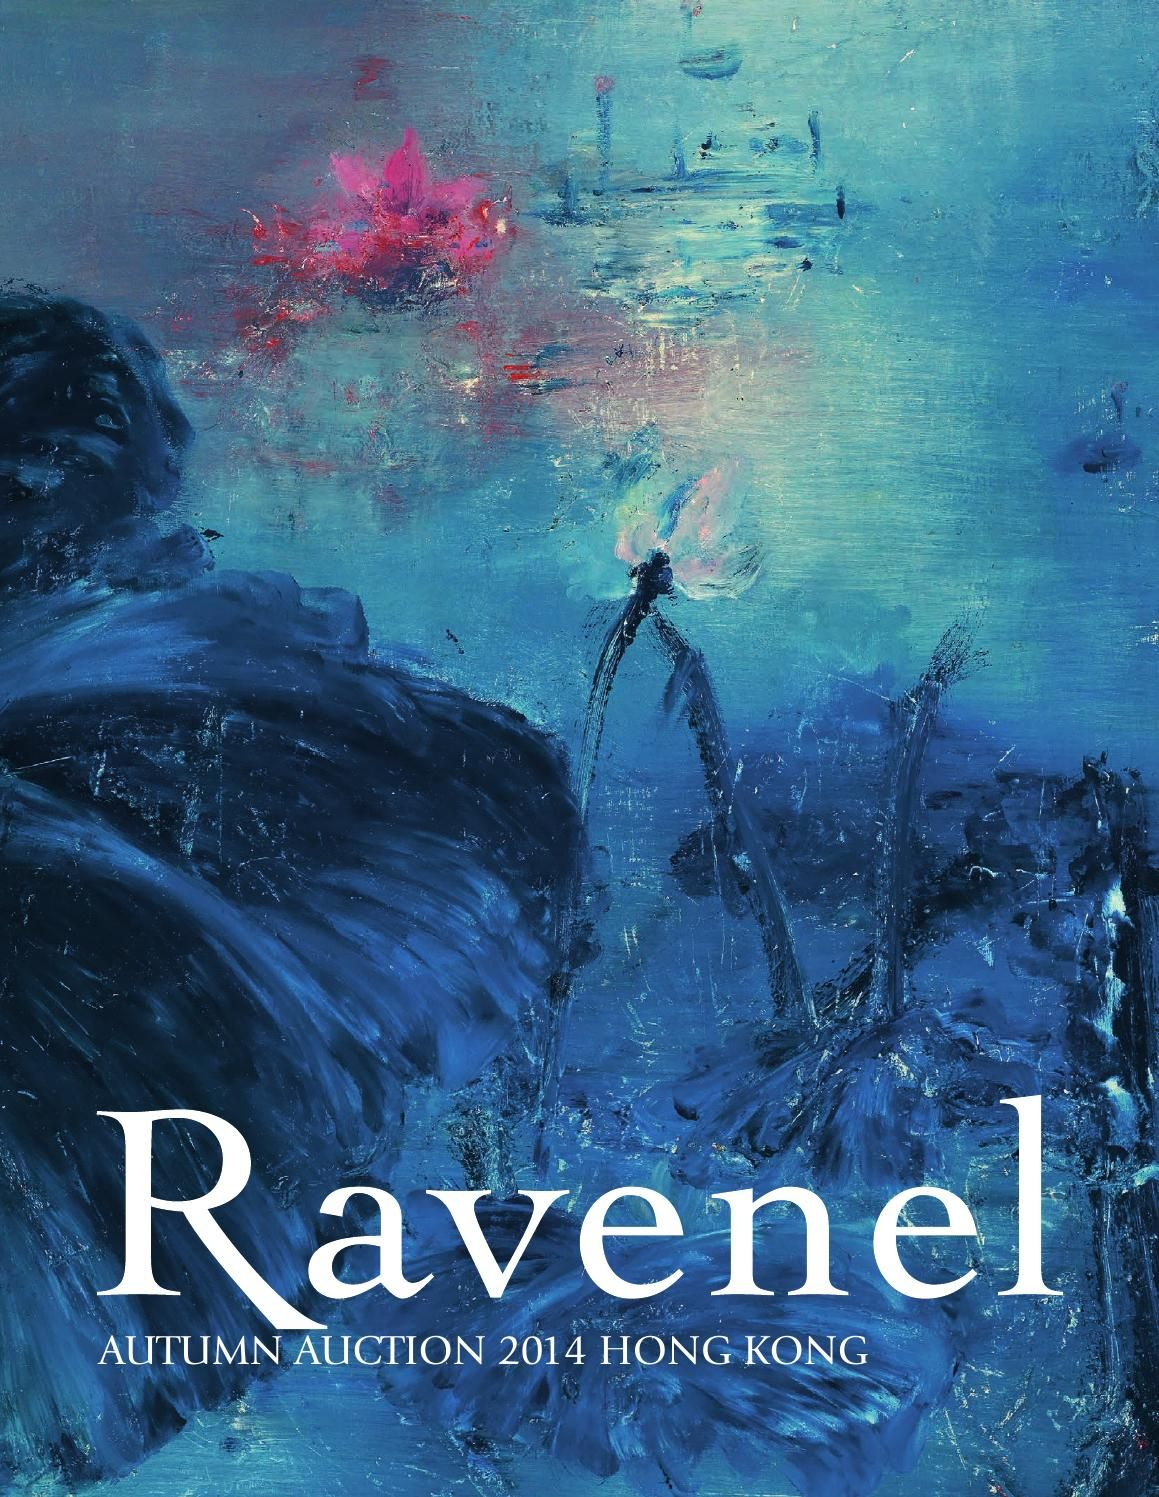 現代與當代藝術 Modern and Contemporary Art  羅芙奧香港2014秋季拍賣會 Ravenel Autumn Auction 2014 Hong Kong